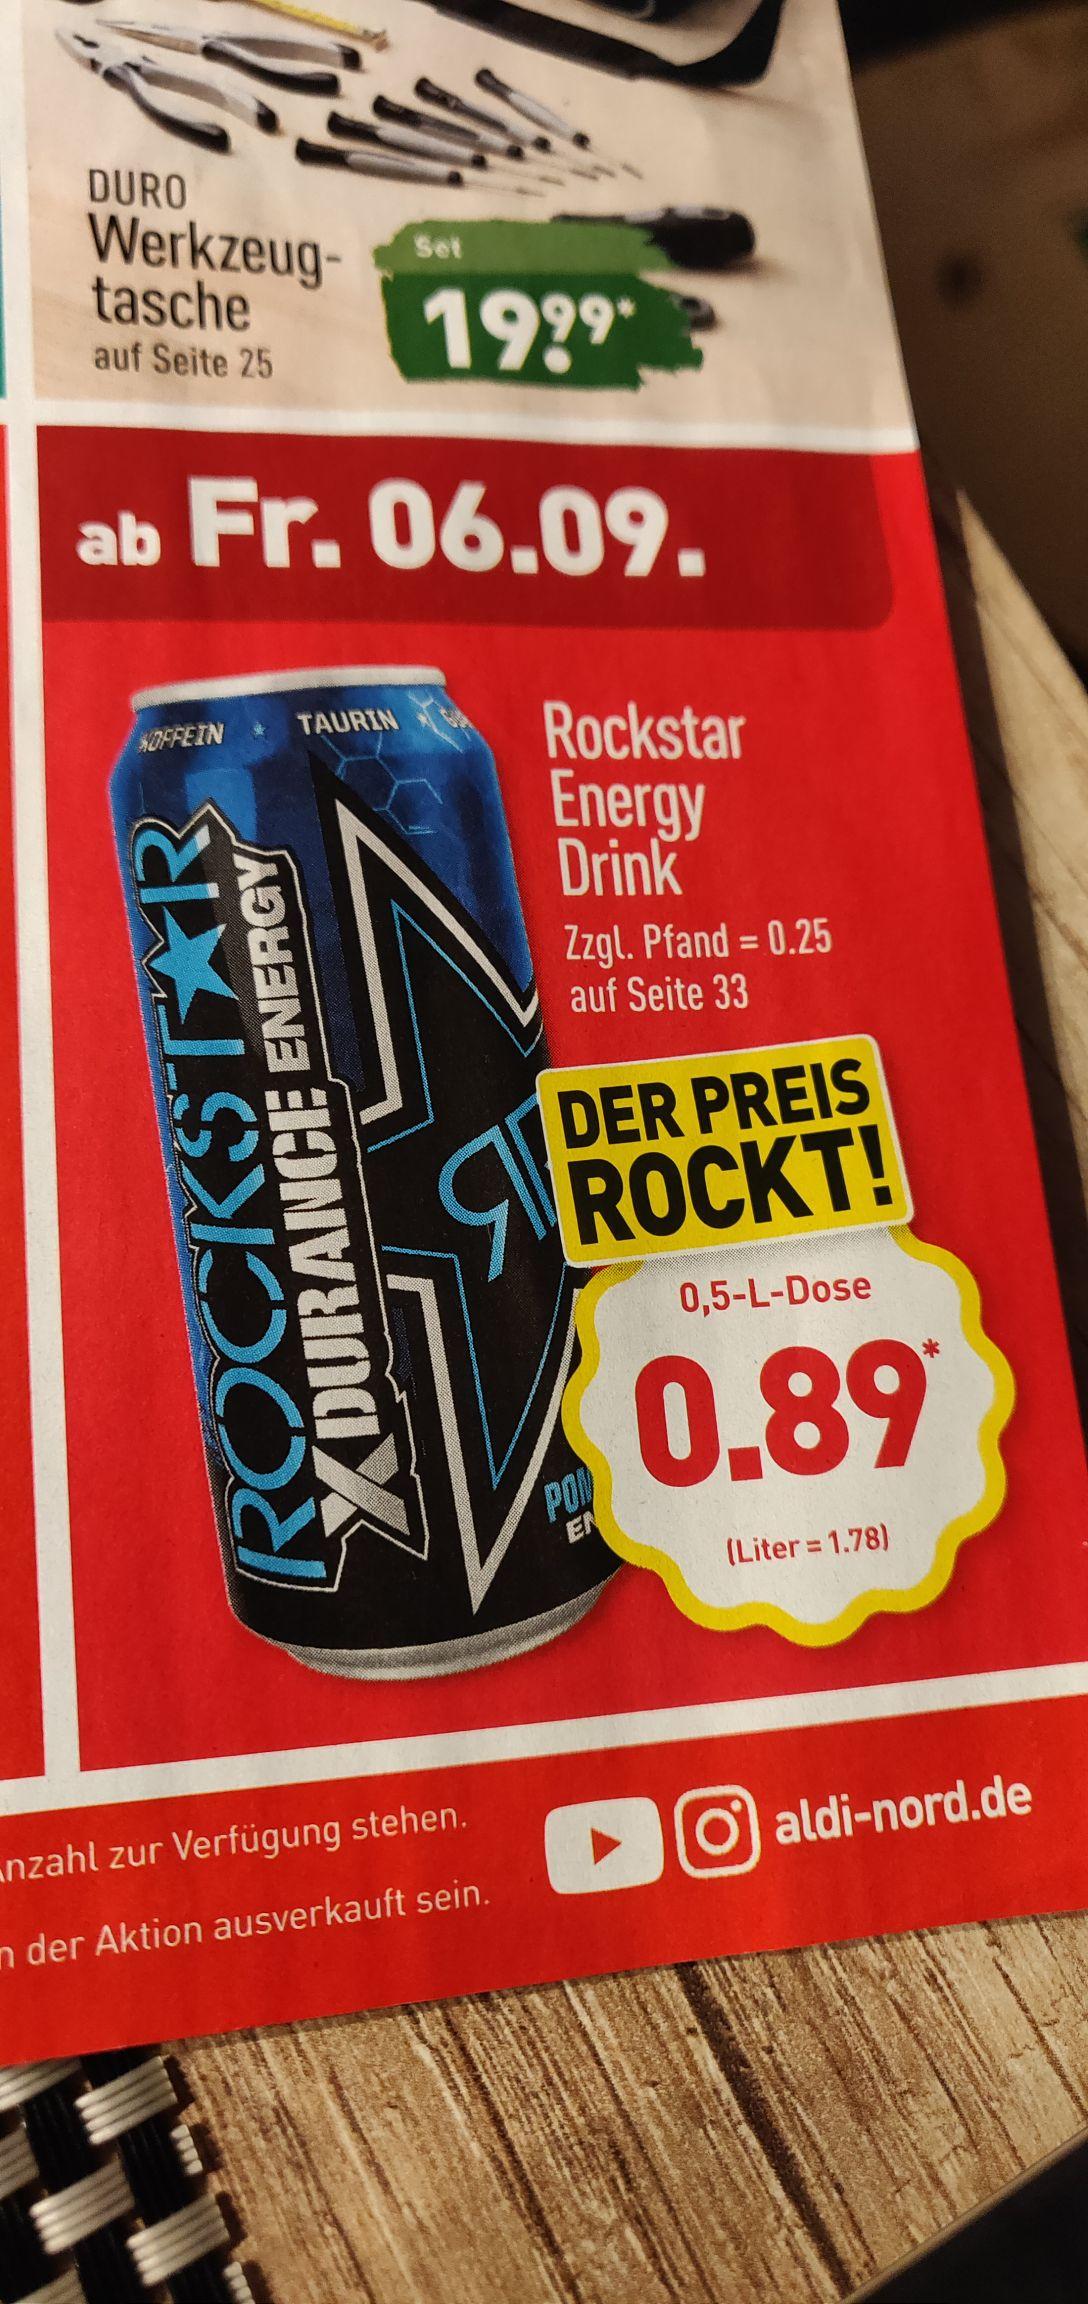 Aldi Nord - Rockstar Energy verschiedene Sorten